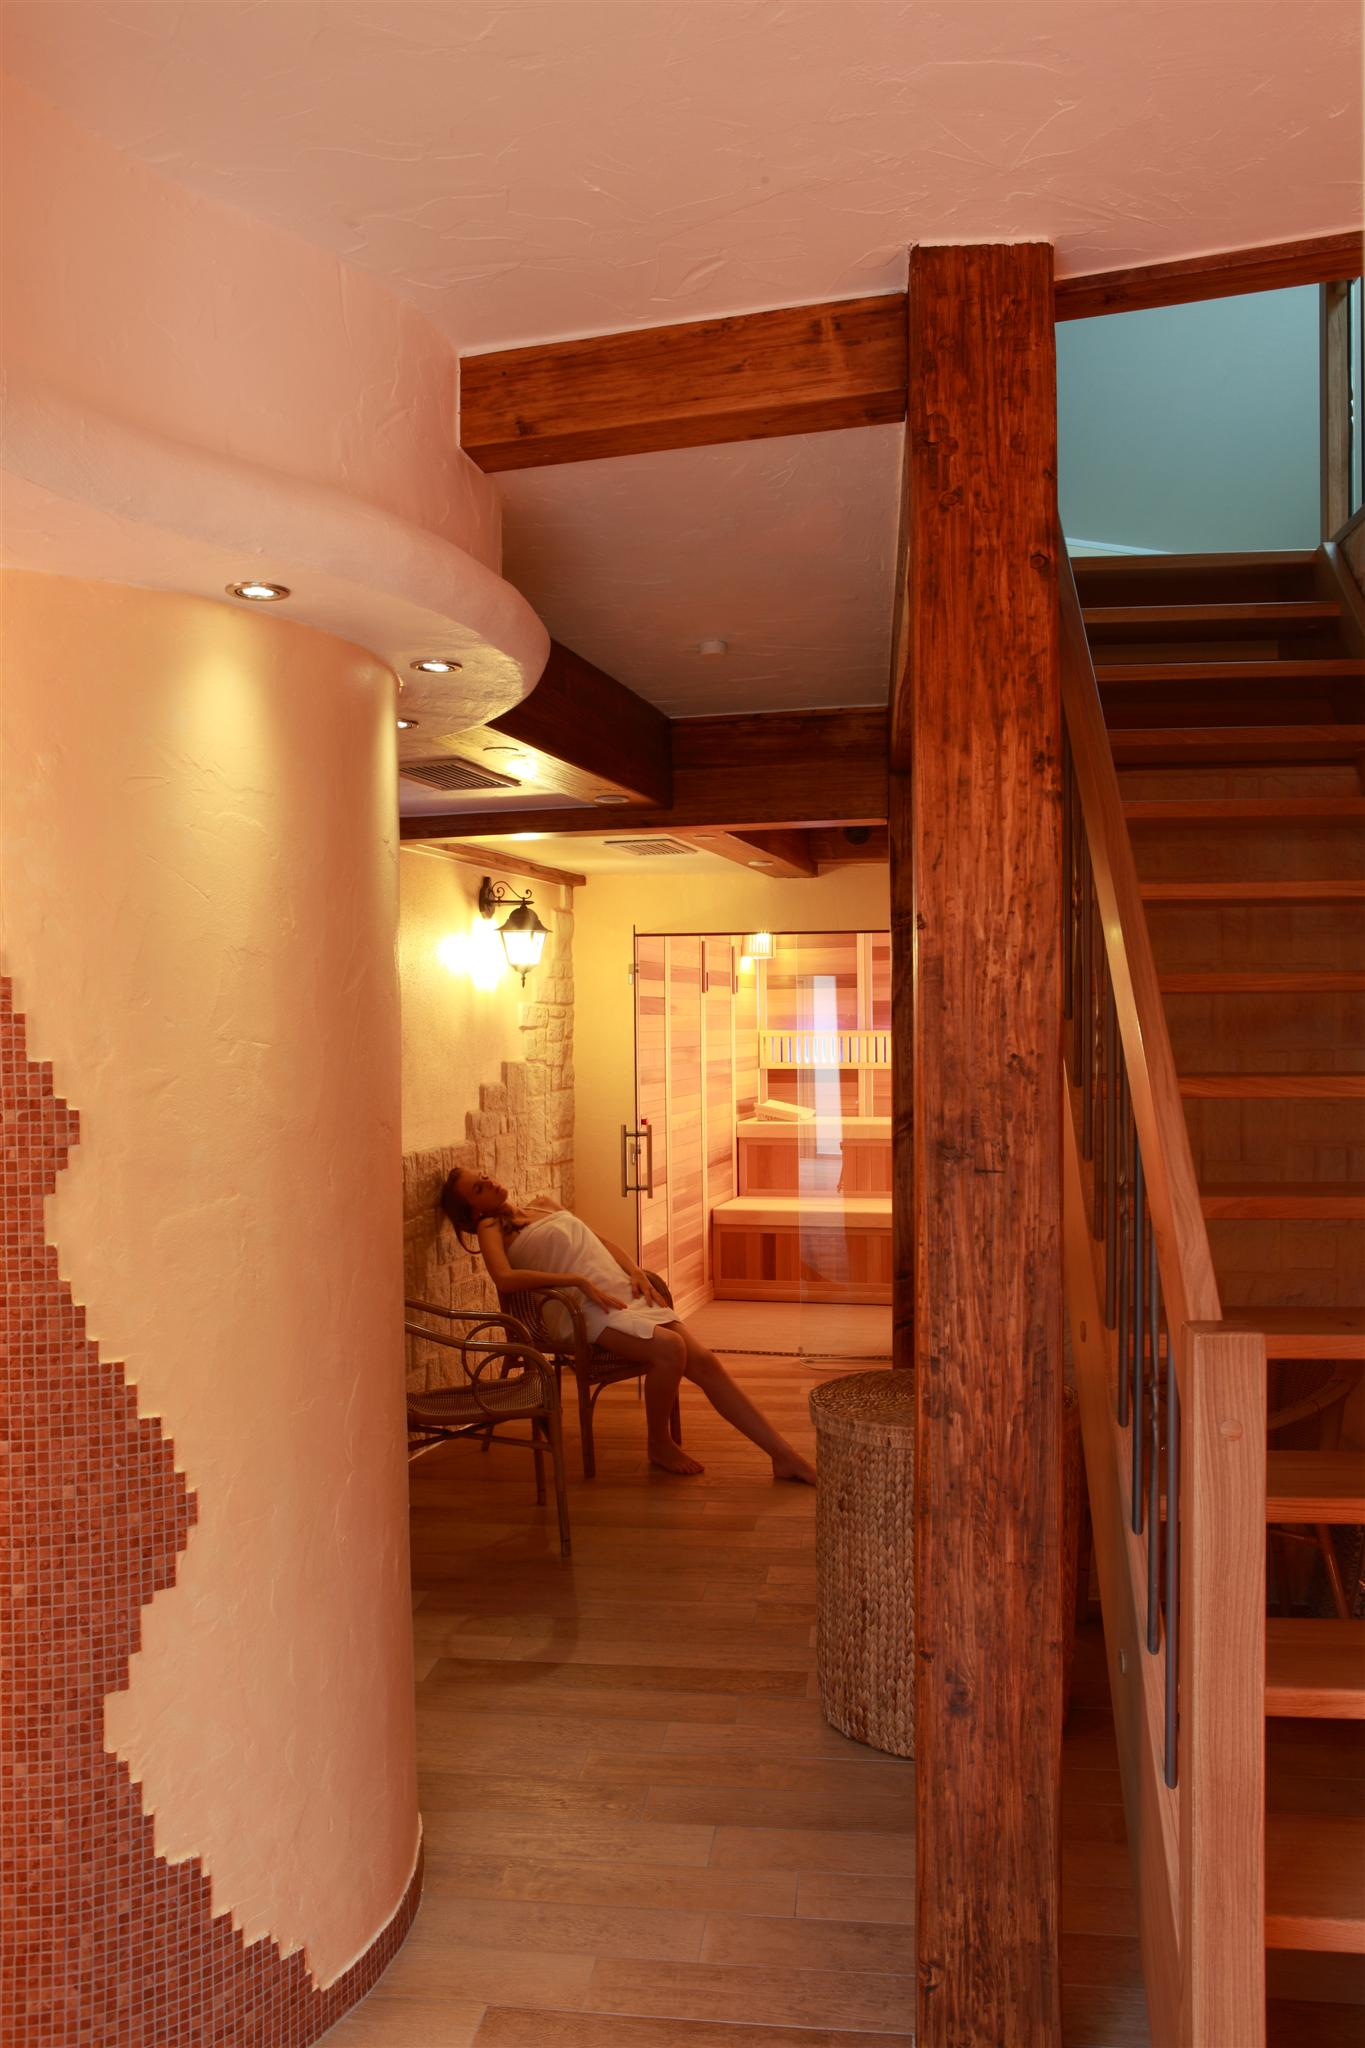 Hôtel By Cubilis ViandenMobilebooker Restaurant Petry bgvmfY6yI7